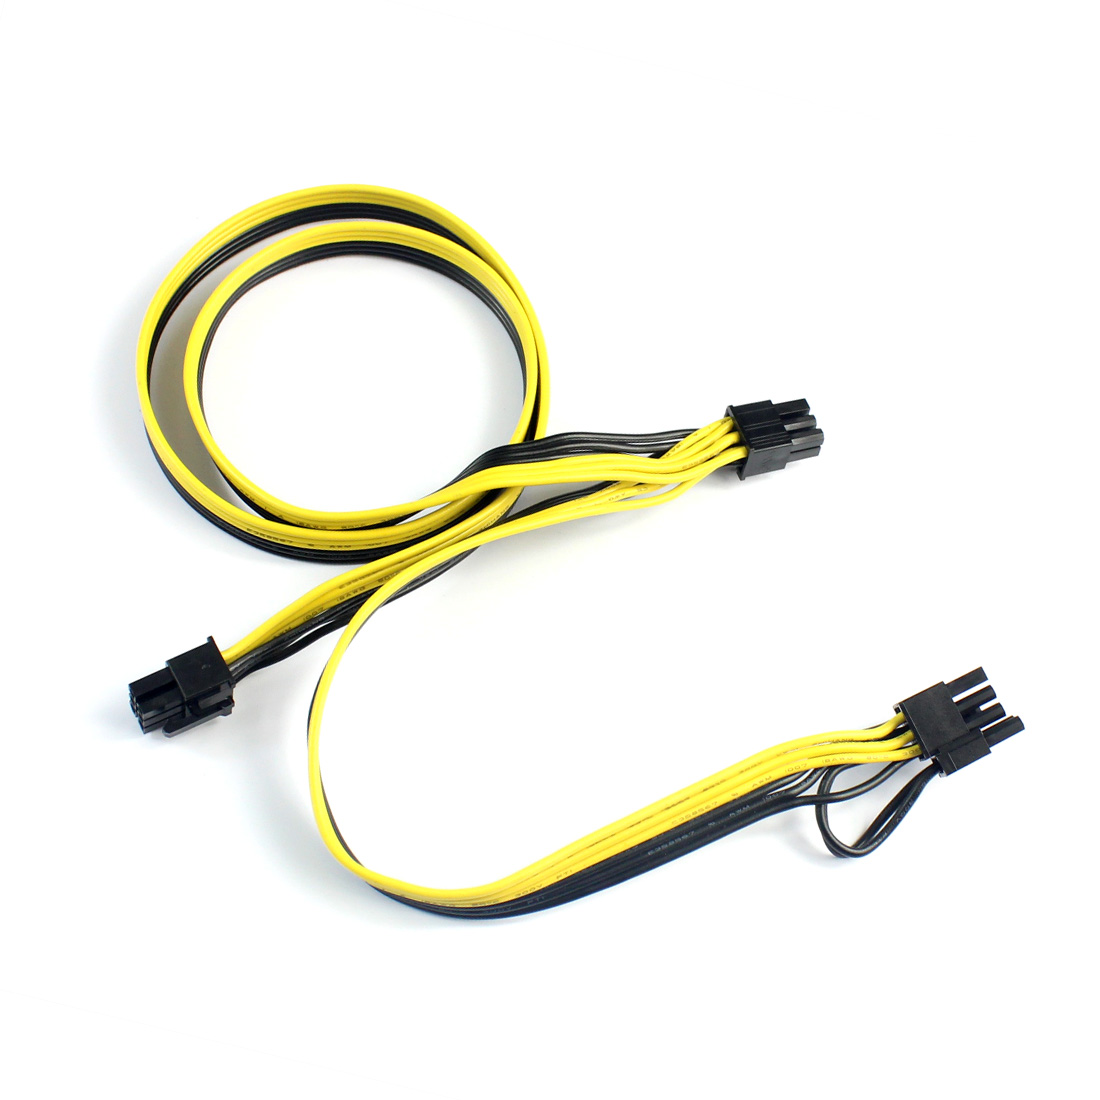 US$ 1.79 - Modular PSU Power Supply Cables PCI e Molex 6pin to 2 ...